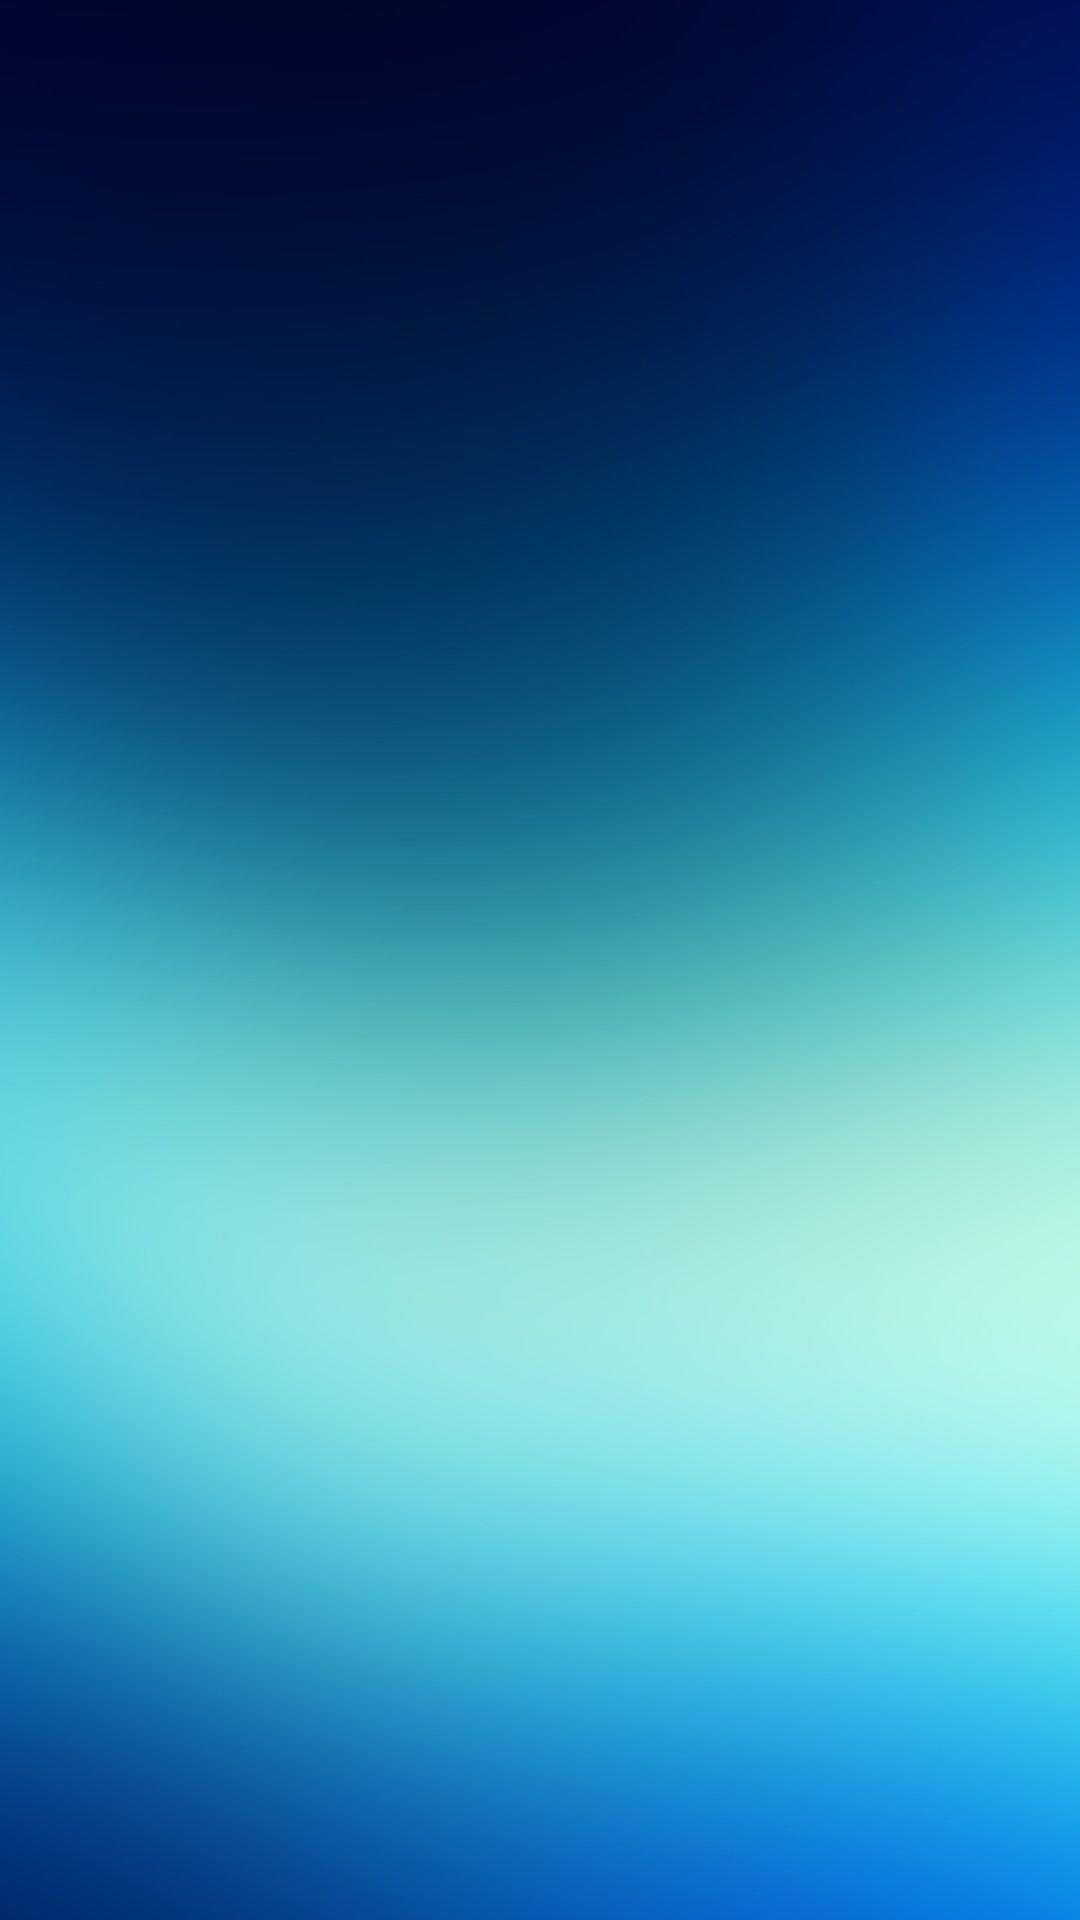 Blue gradient Wallpaper